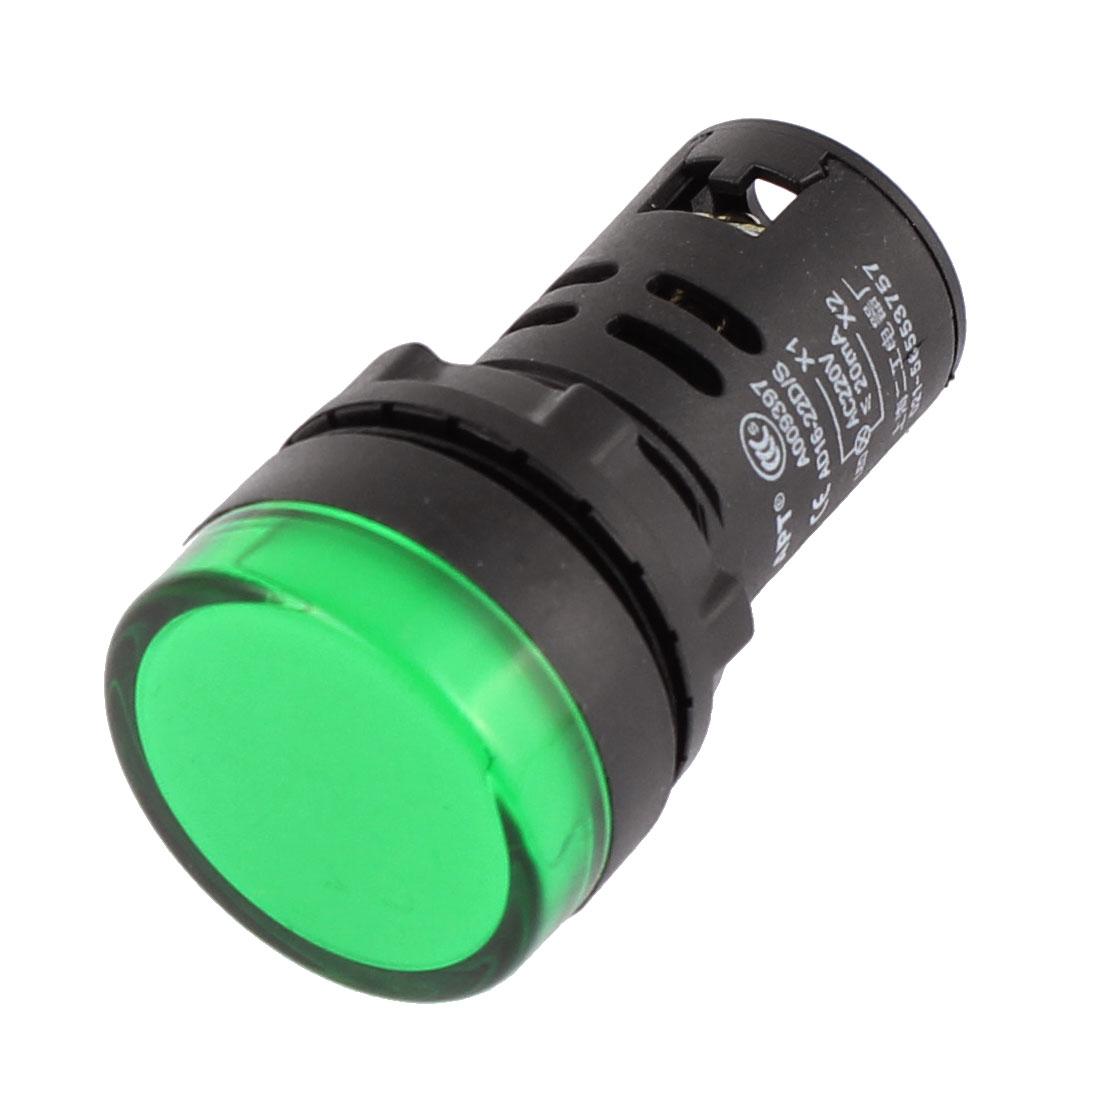 AC 220V 20mA Green Electrical Circuit LED Indicator Pilot Signal Light Lamp